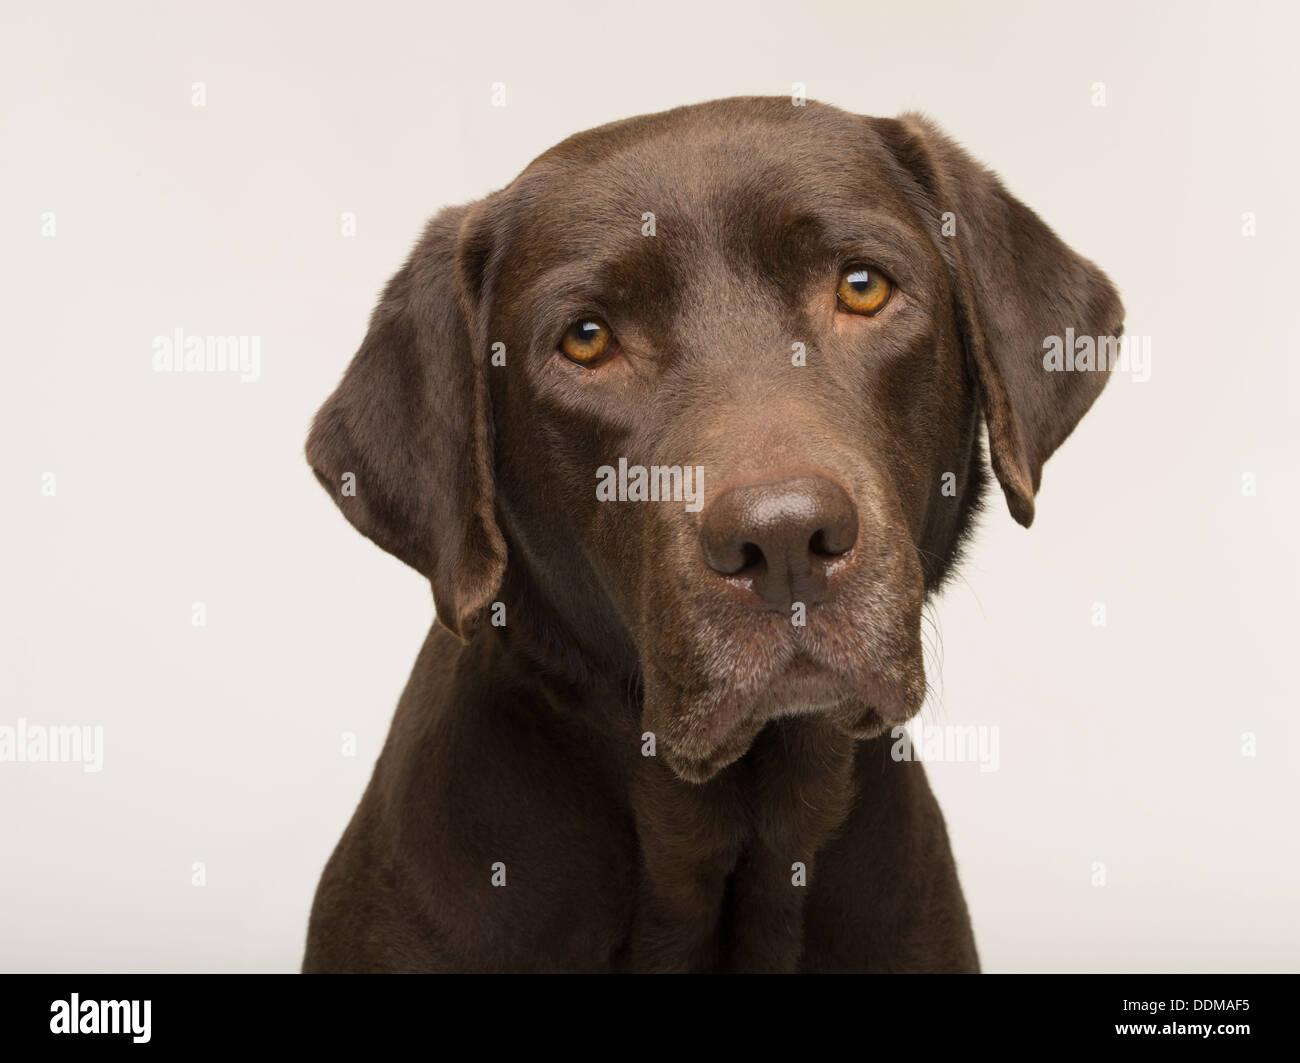 Labrador Retriever chocolate perro adulto hembra retrato sobre fondo blanco studio Foto de stock